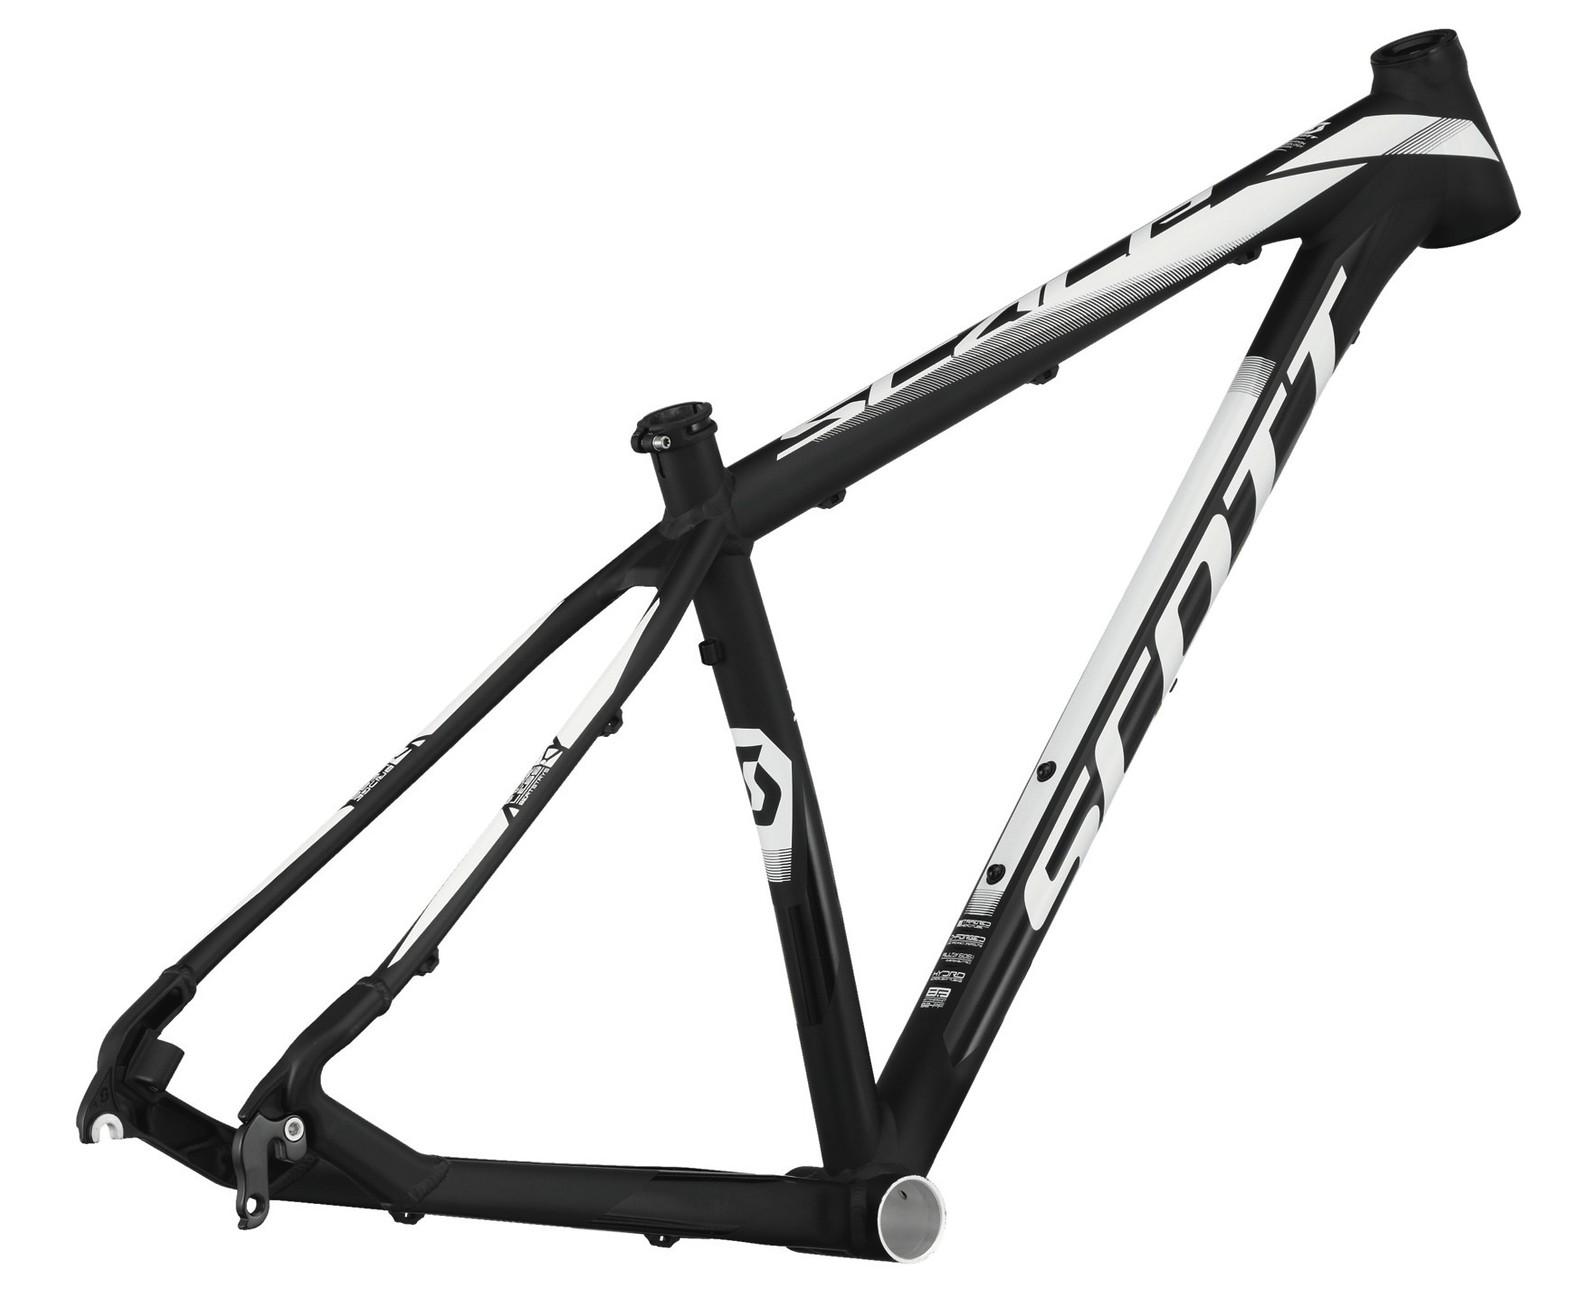 682b5c1e6ef Scott Scale 940 Frame - Reviews, Comparisons, Specs - Mountain Bike ...